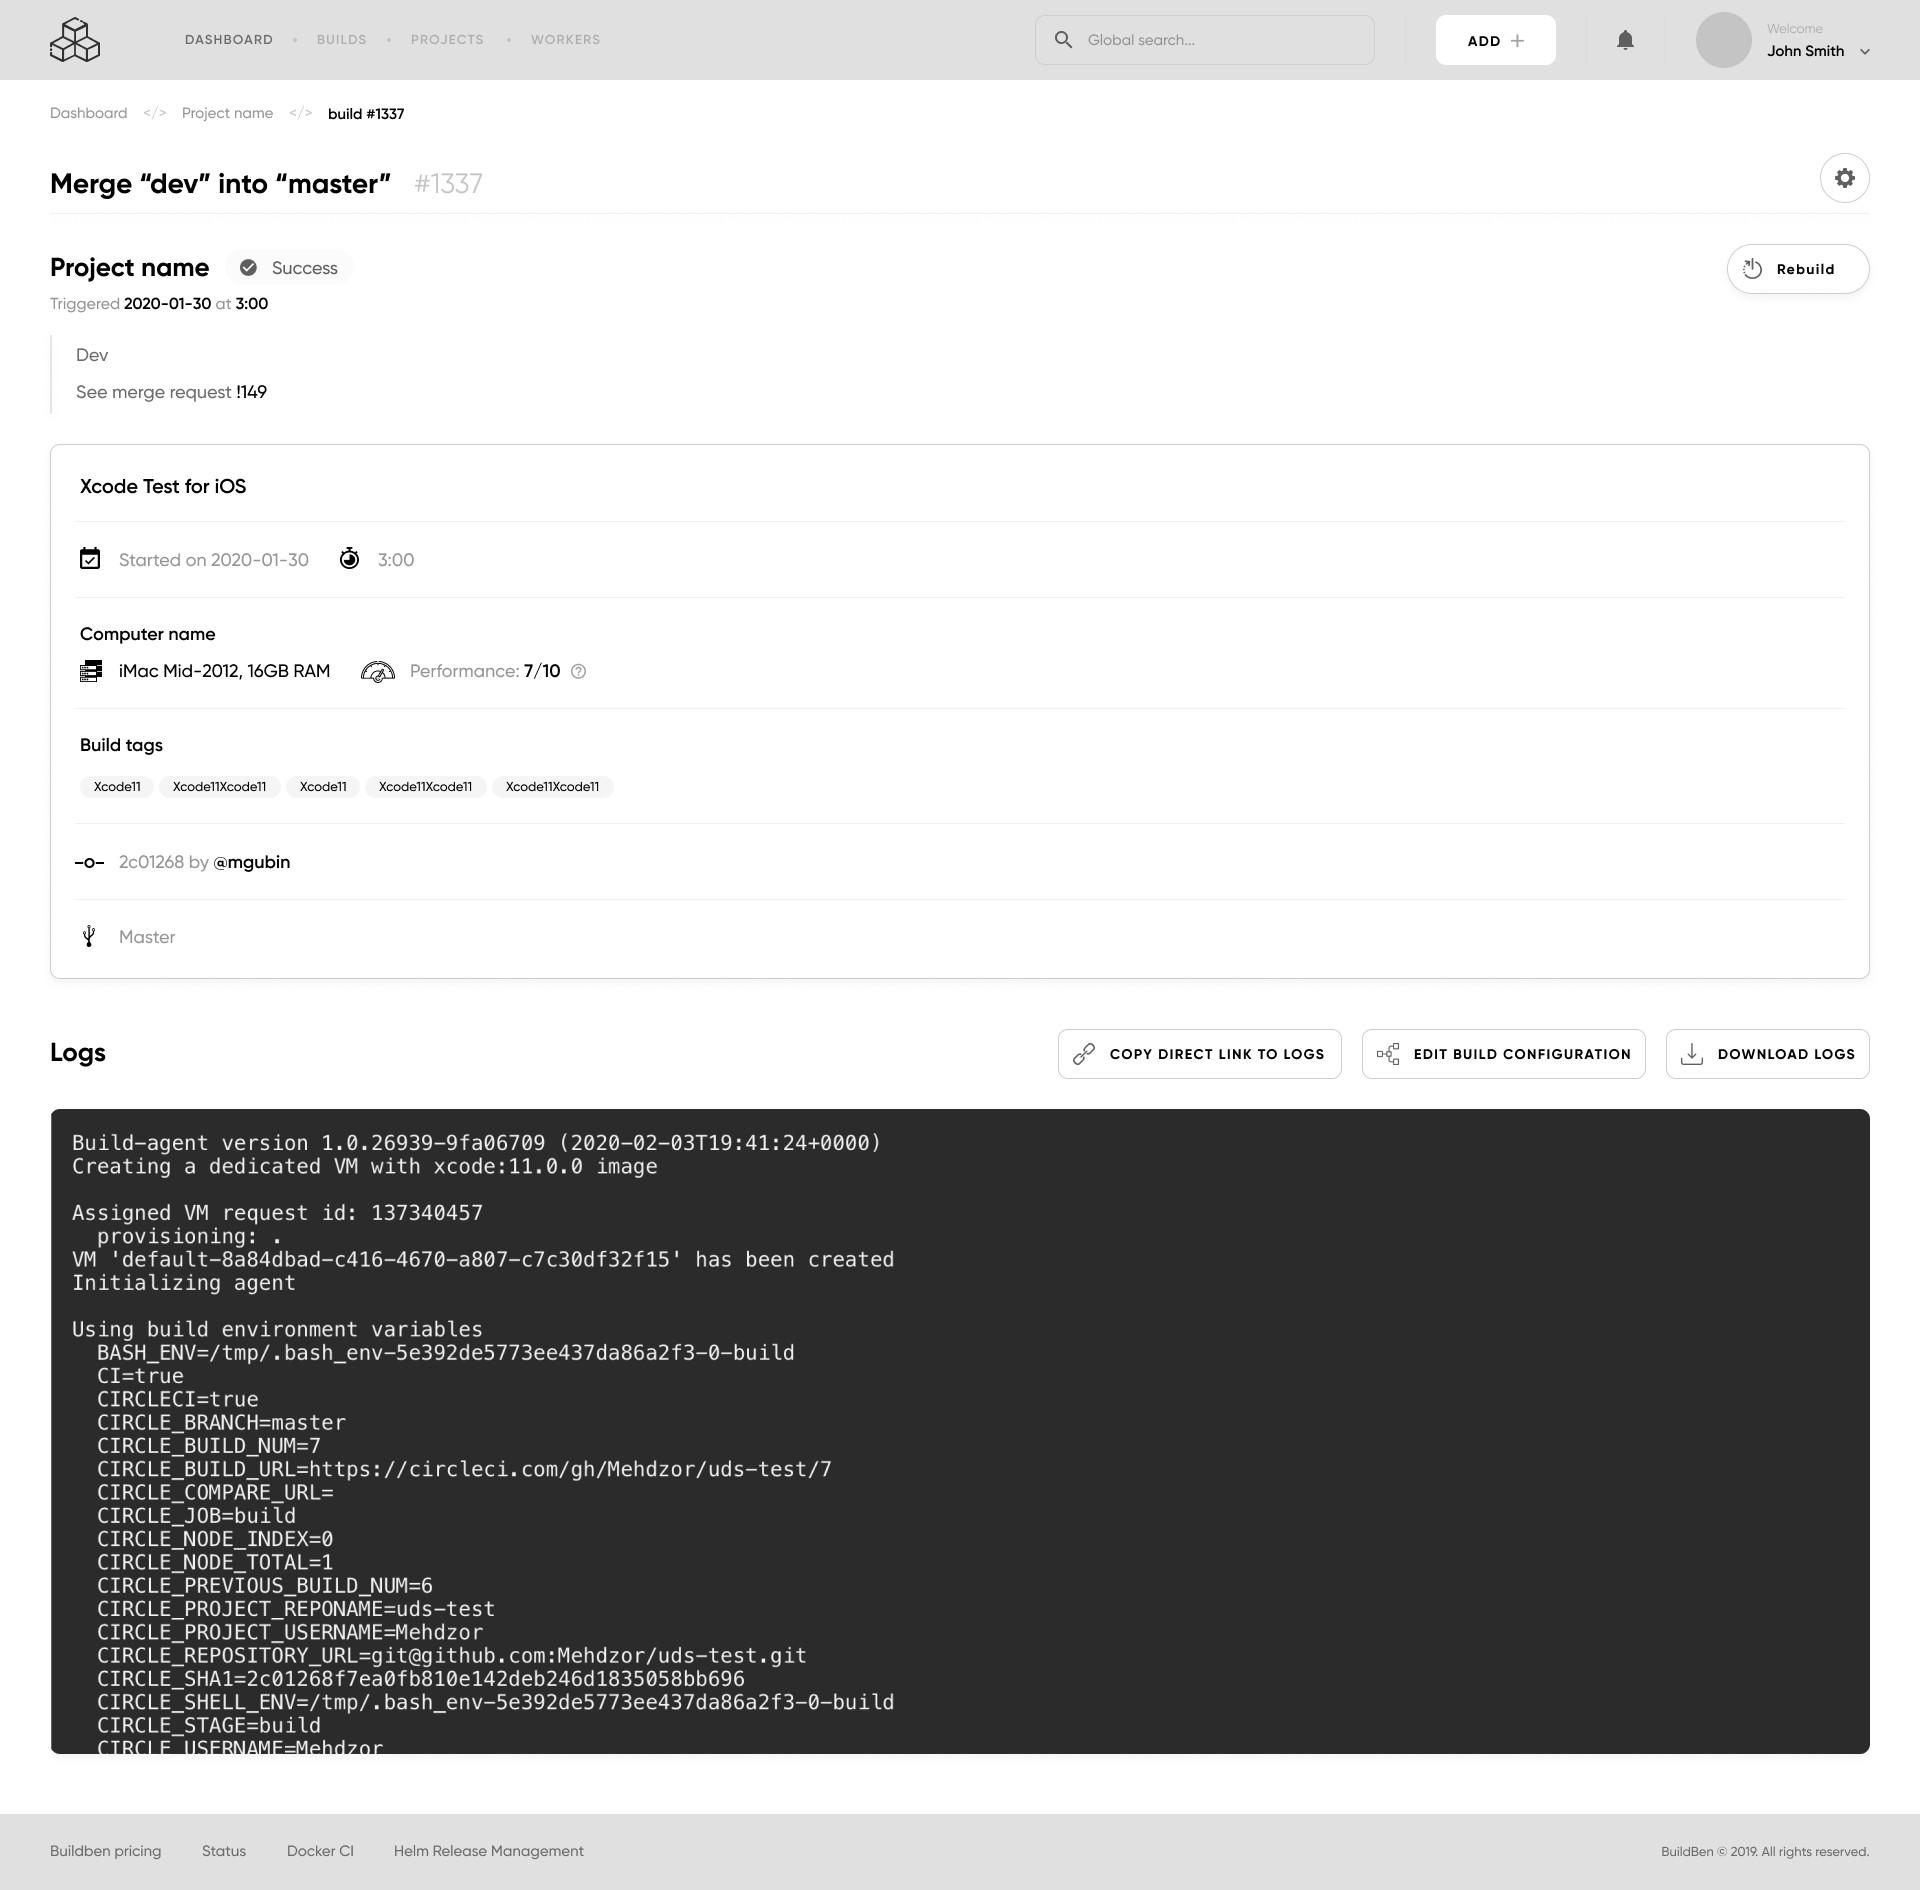 02_Build_Details_Dashboard